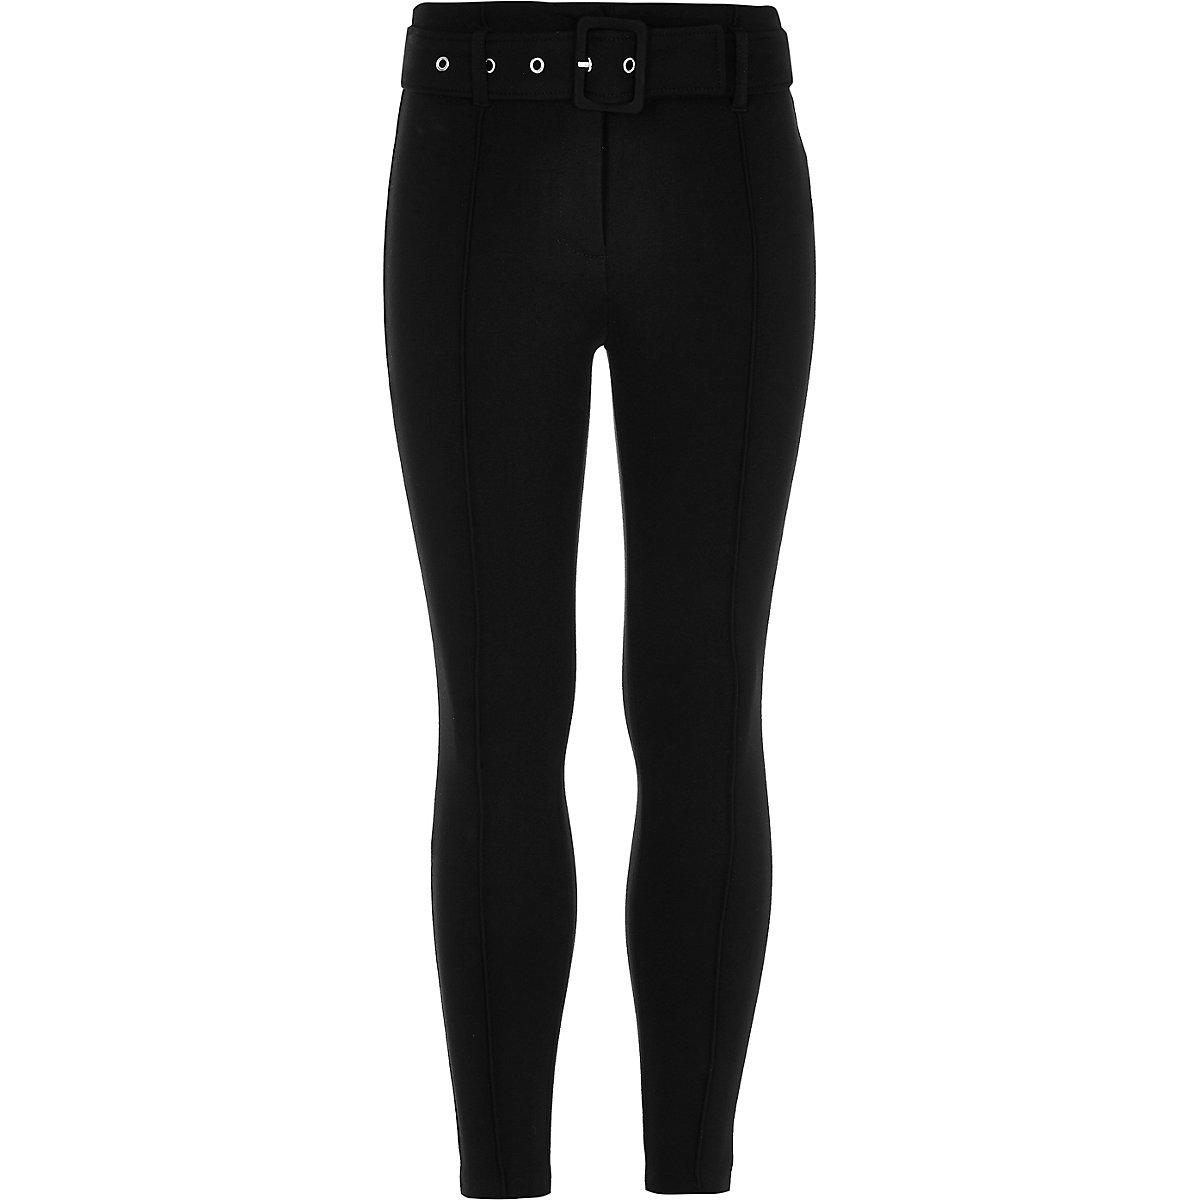 Girls RI Active black ponte belted leggings